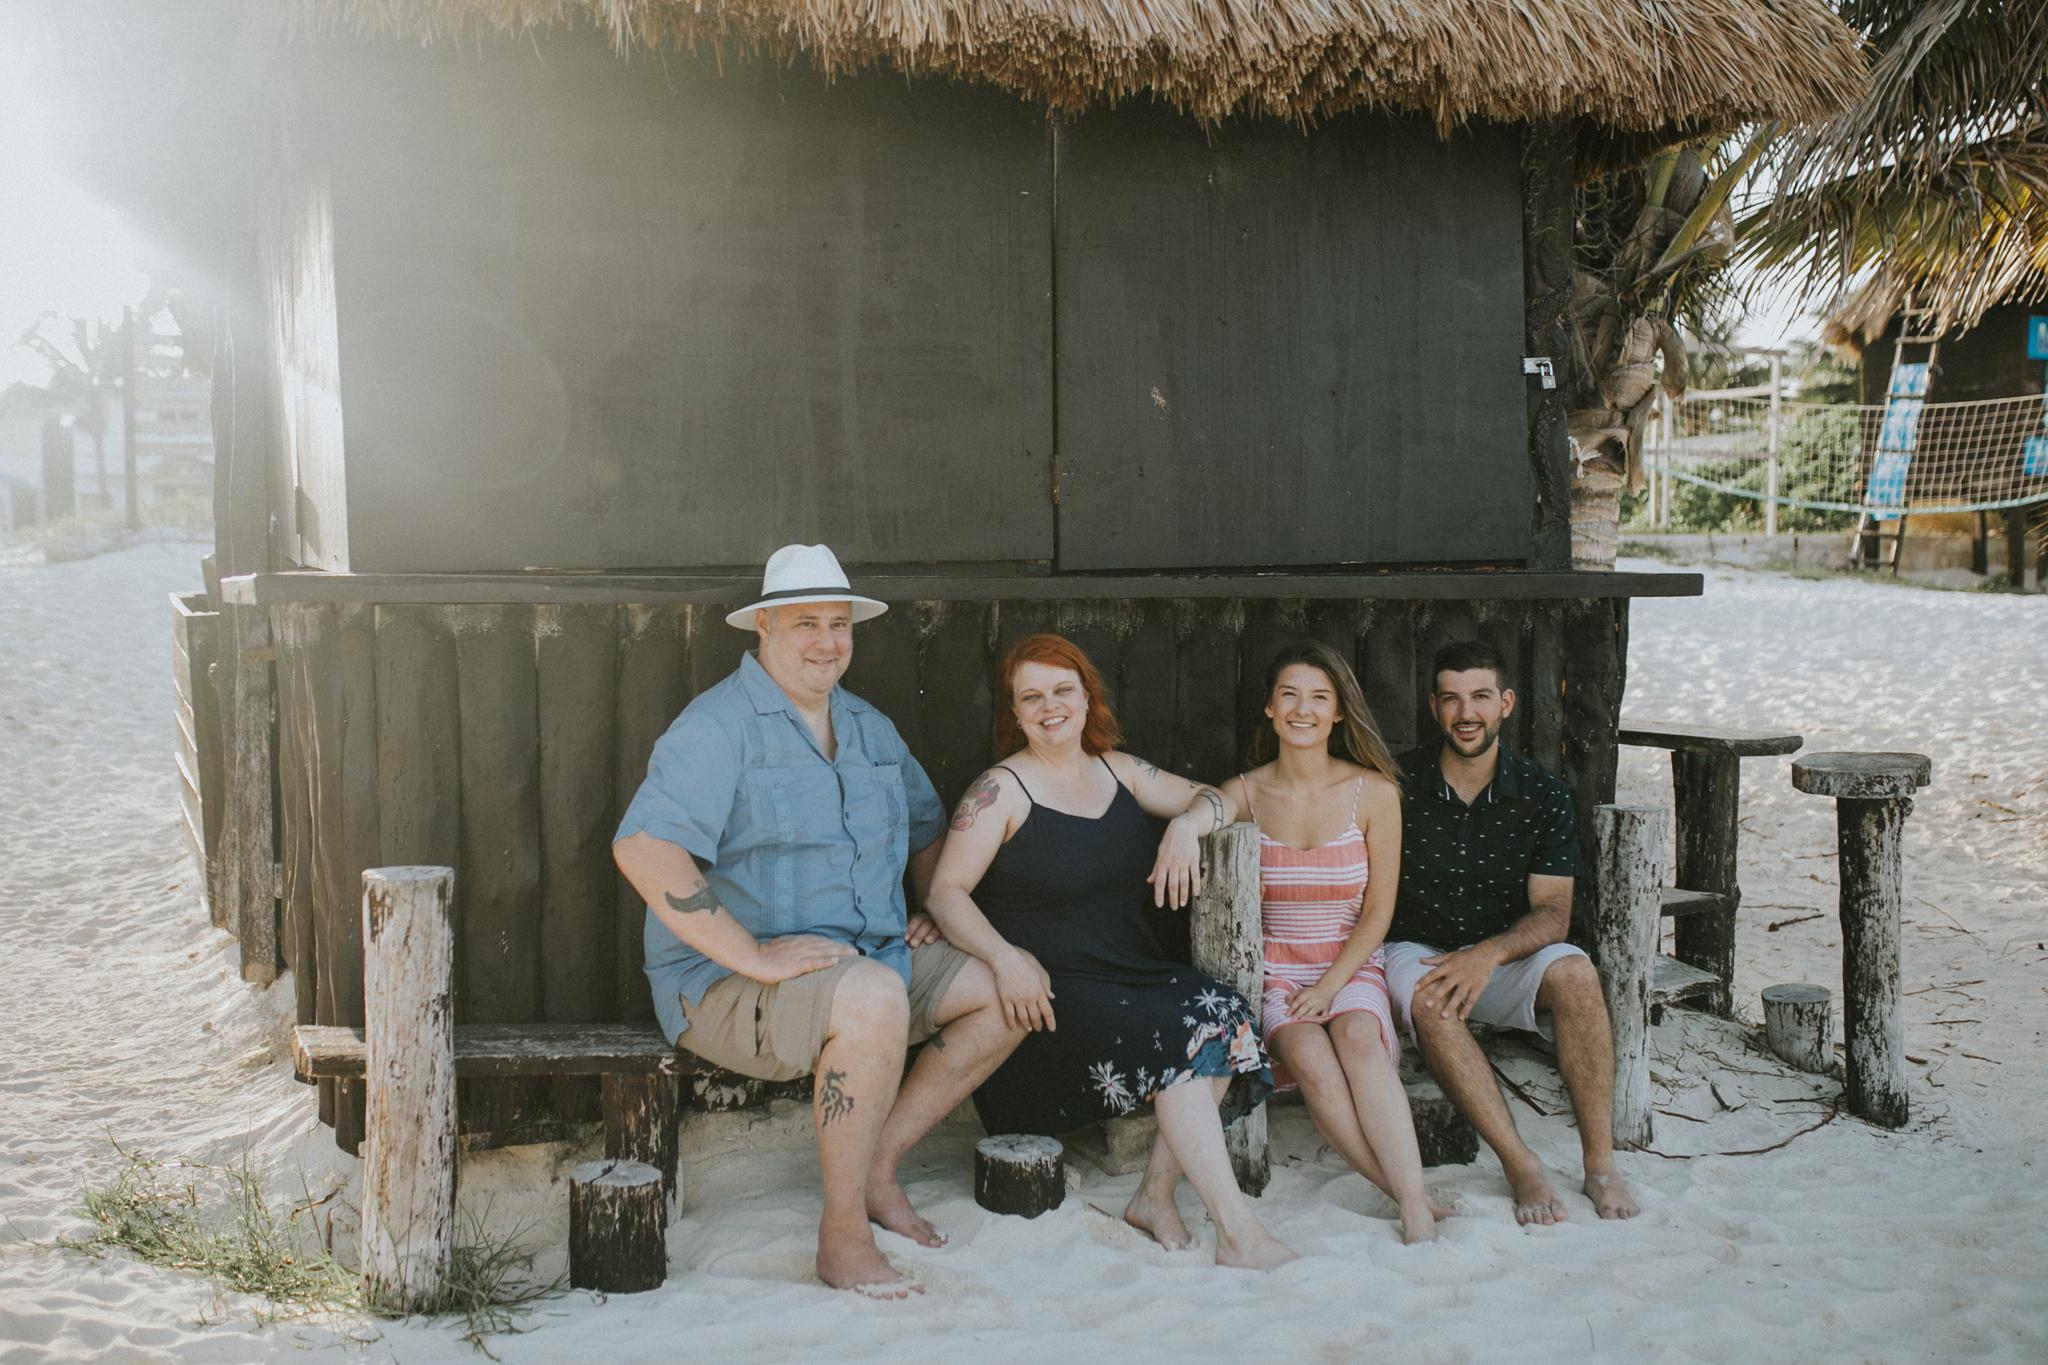 cancun-07-13-2019-family-trip-2_original.jpg